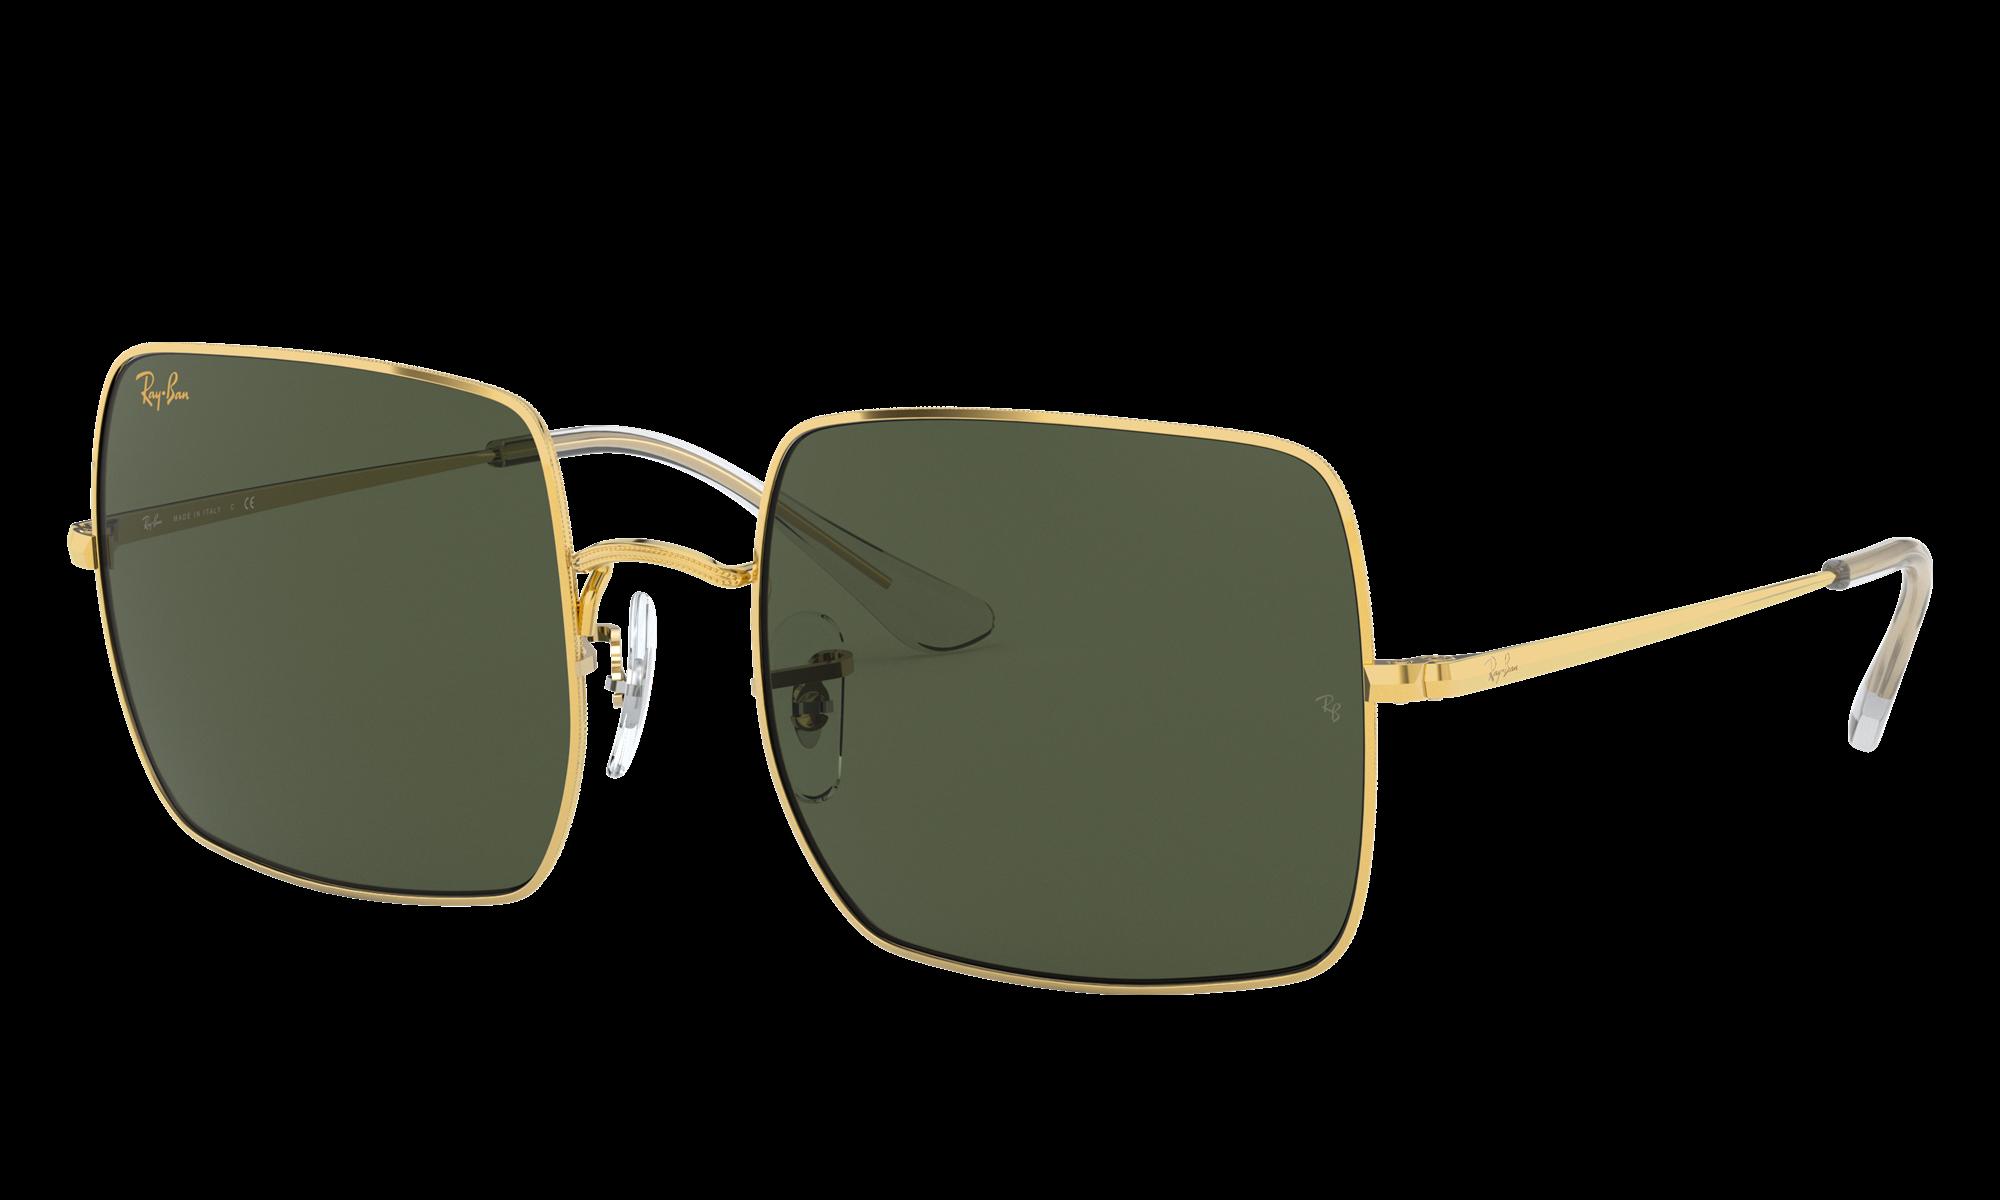 1960s Sunglasses | 70s Sunglasses, 70s Glasses Ray-Ban Unisex Square 1971 Legend Gold Gold Size Standard $154.00 AT vintagedancer.com